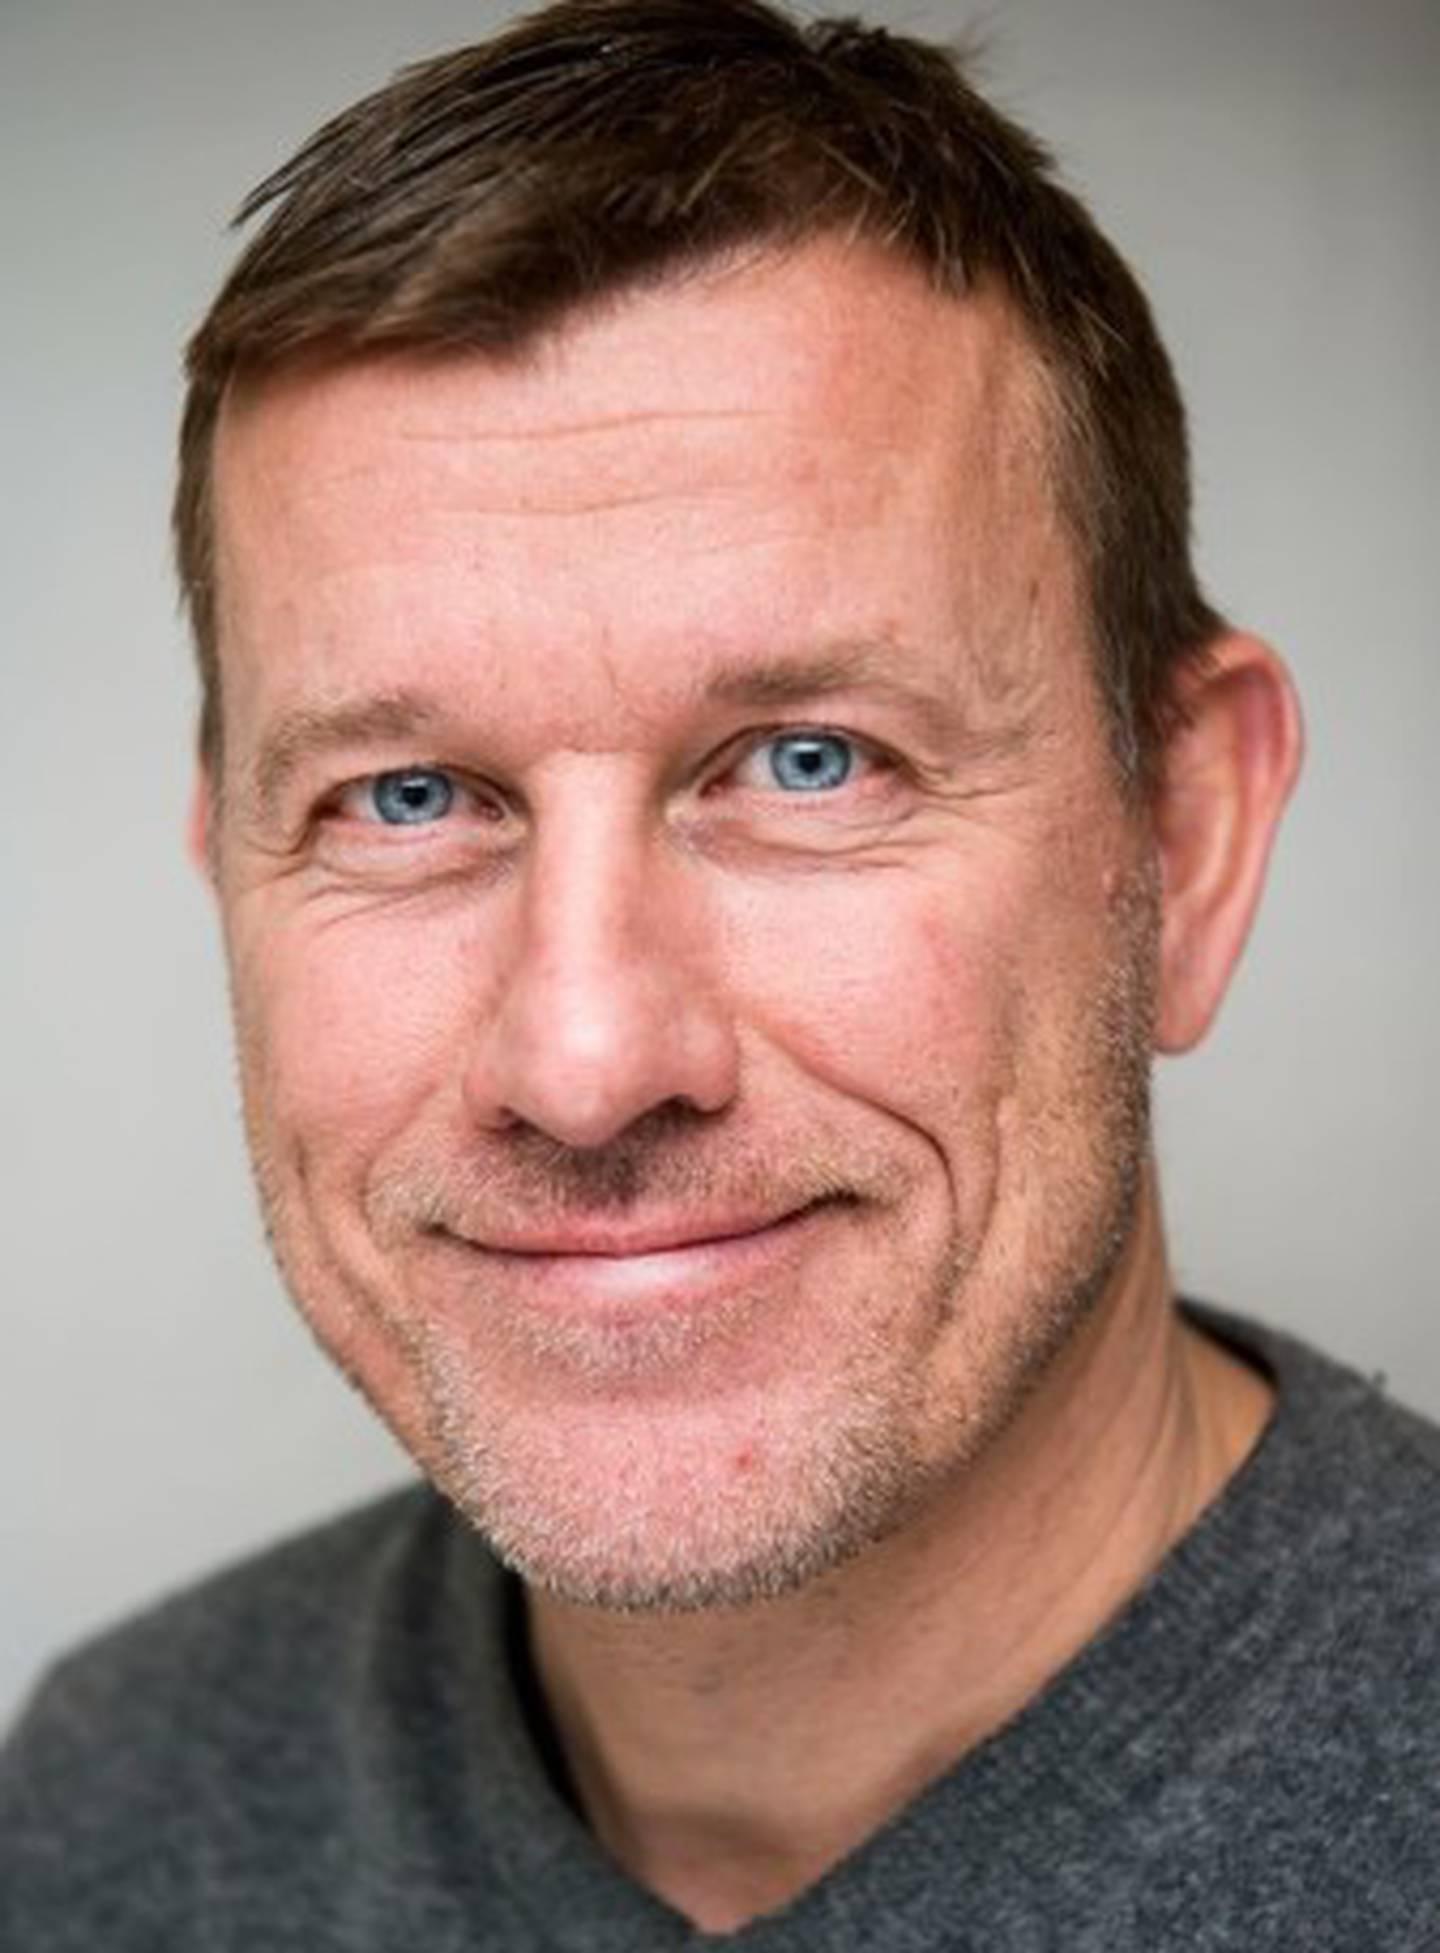 Forsker Svenn-Erik Mamelund